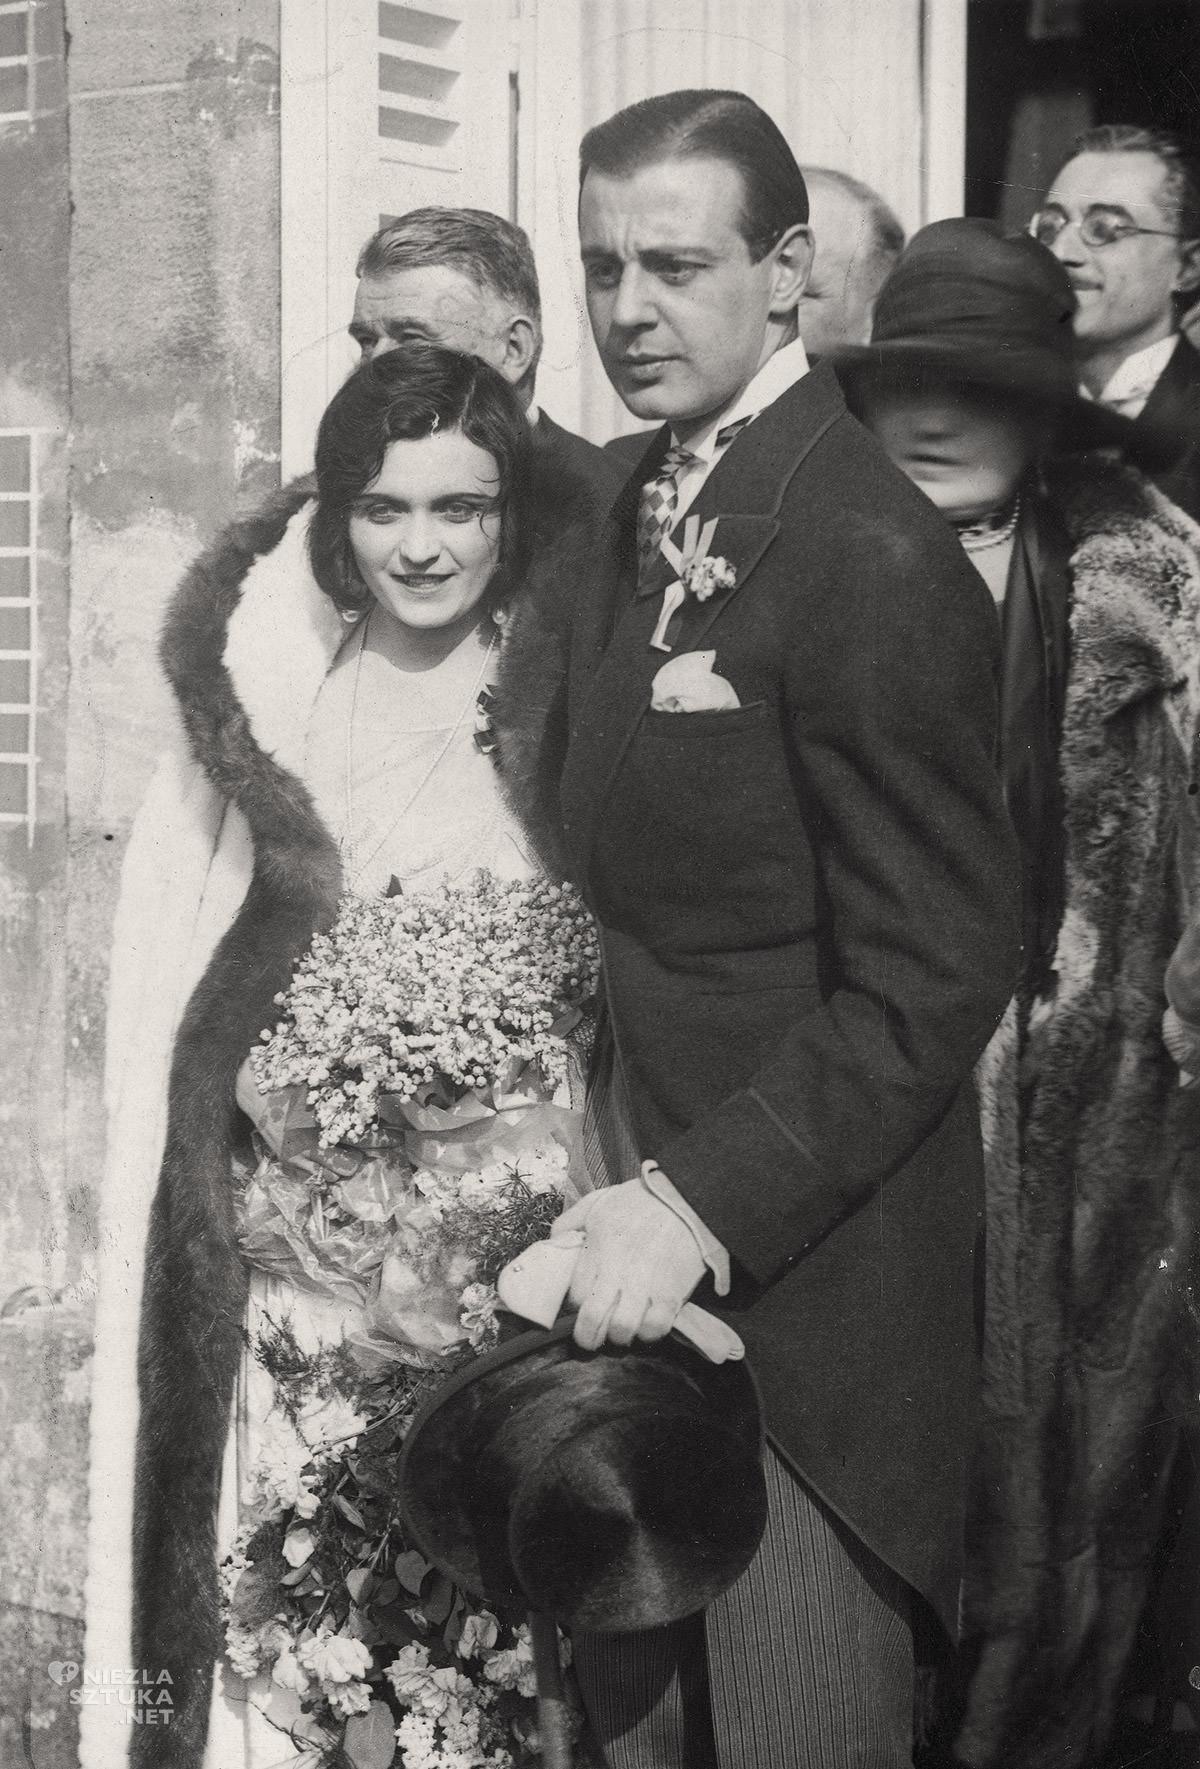 Pola Negri, ślub, Sergiusz Mdivani, niezła sztuka